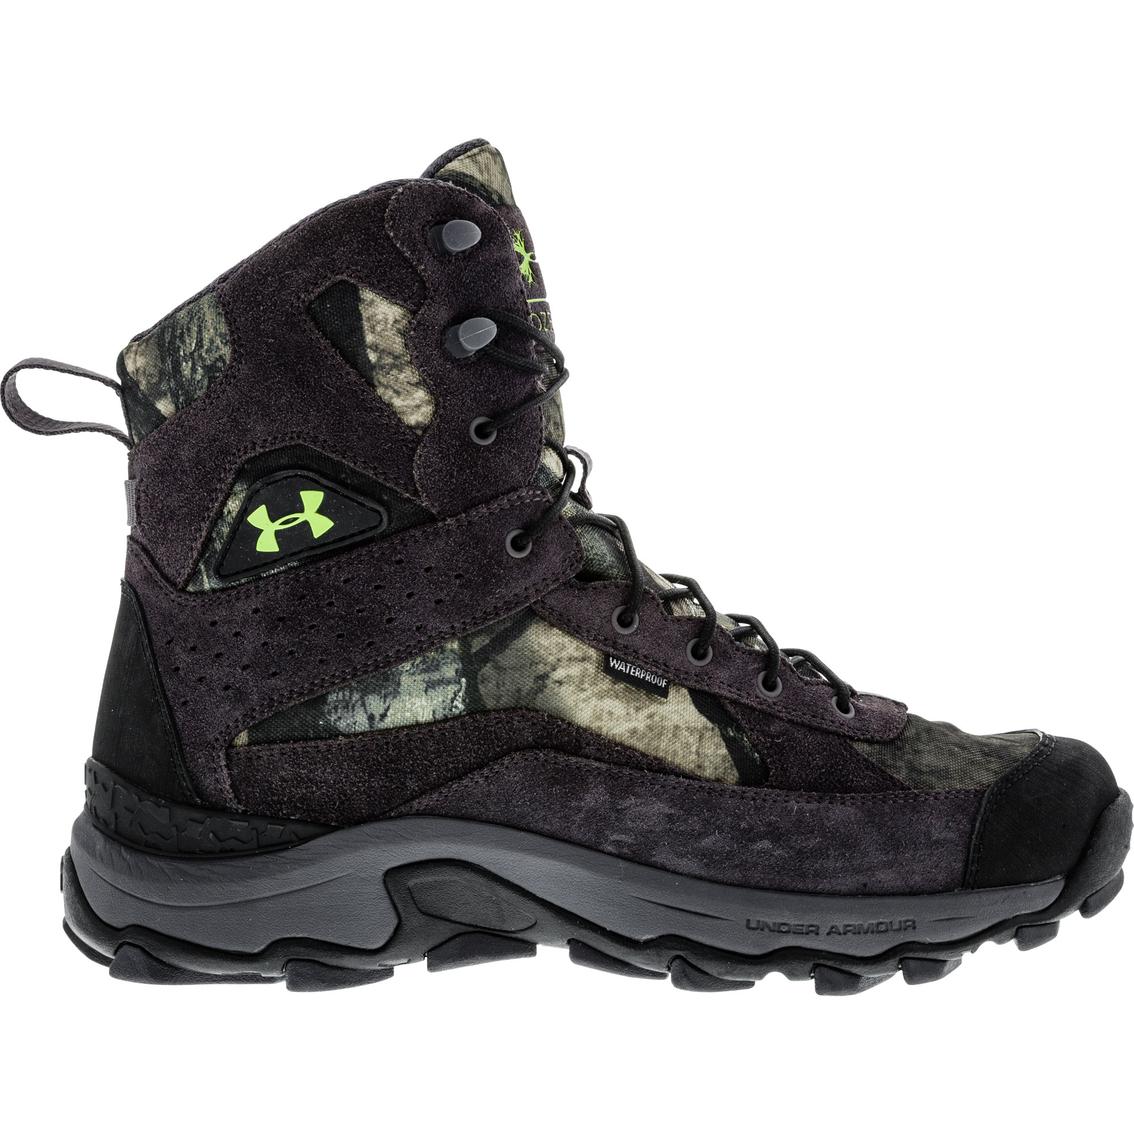 Under Armour Menu0026#39;s Speed Freek Bozeman Boots | Work ...